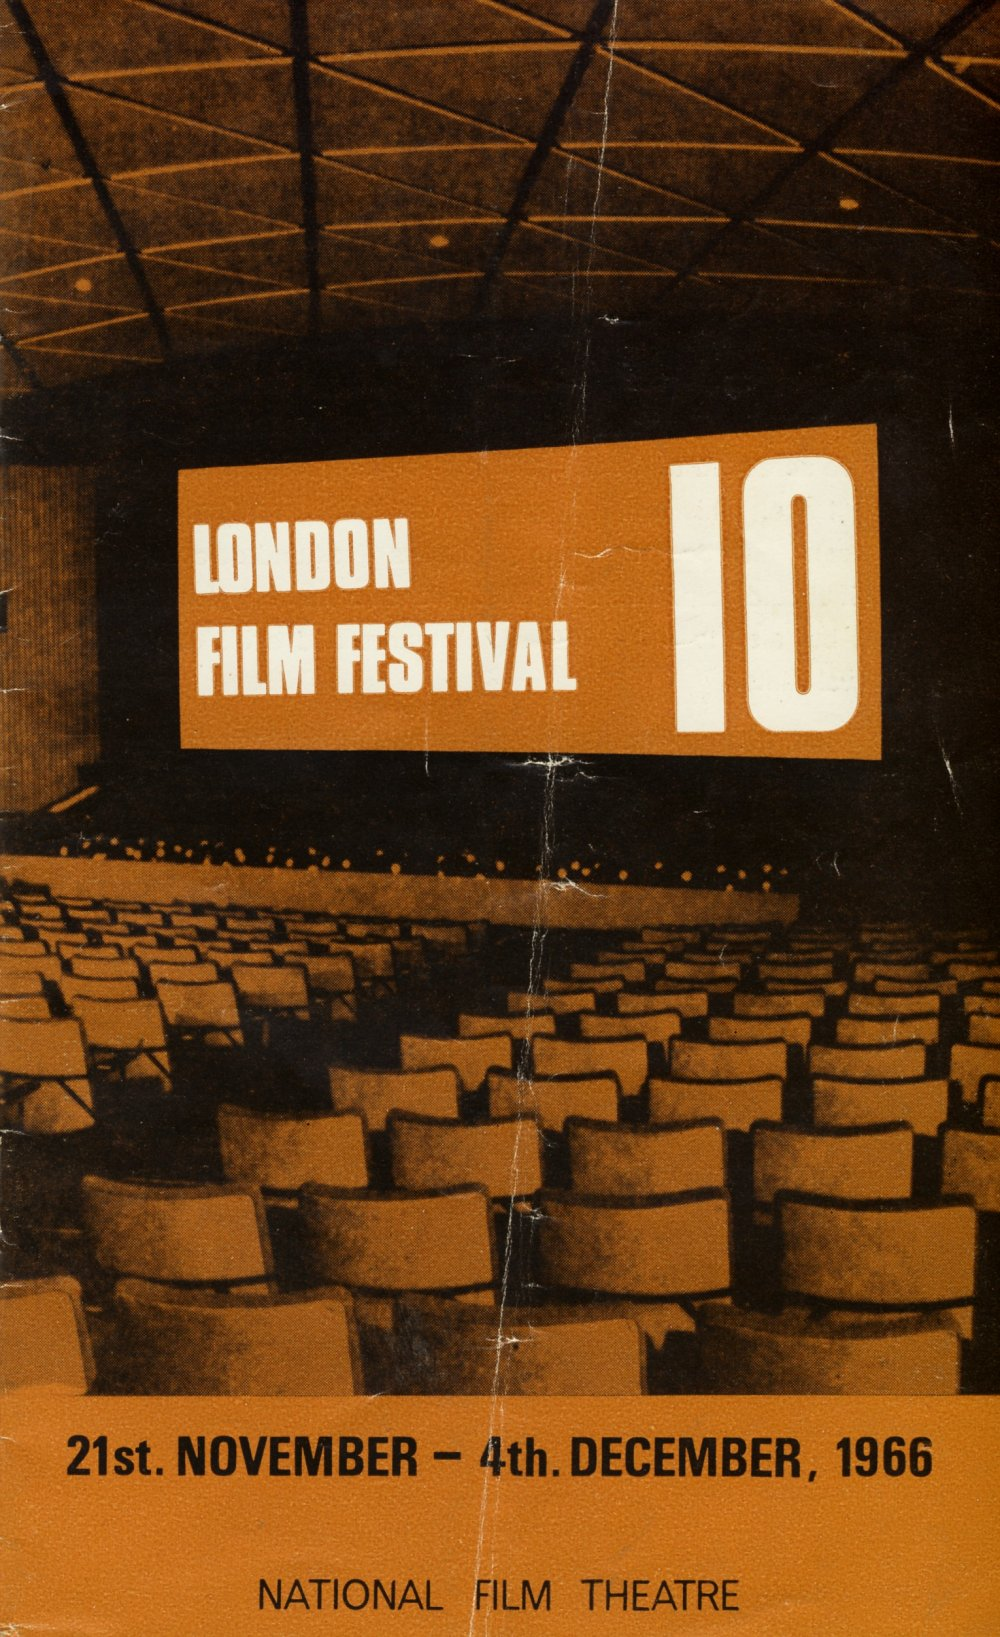 LFF brochure 1966